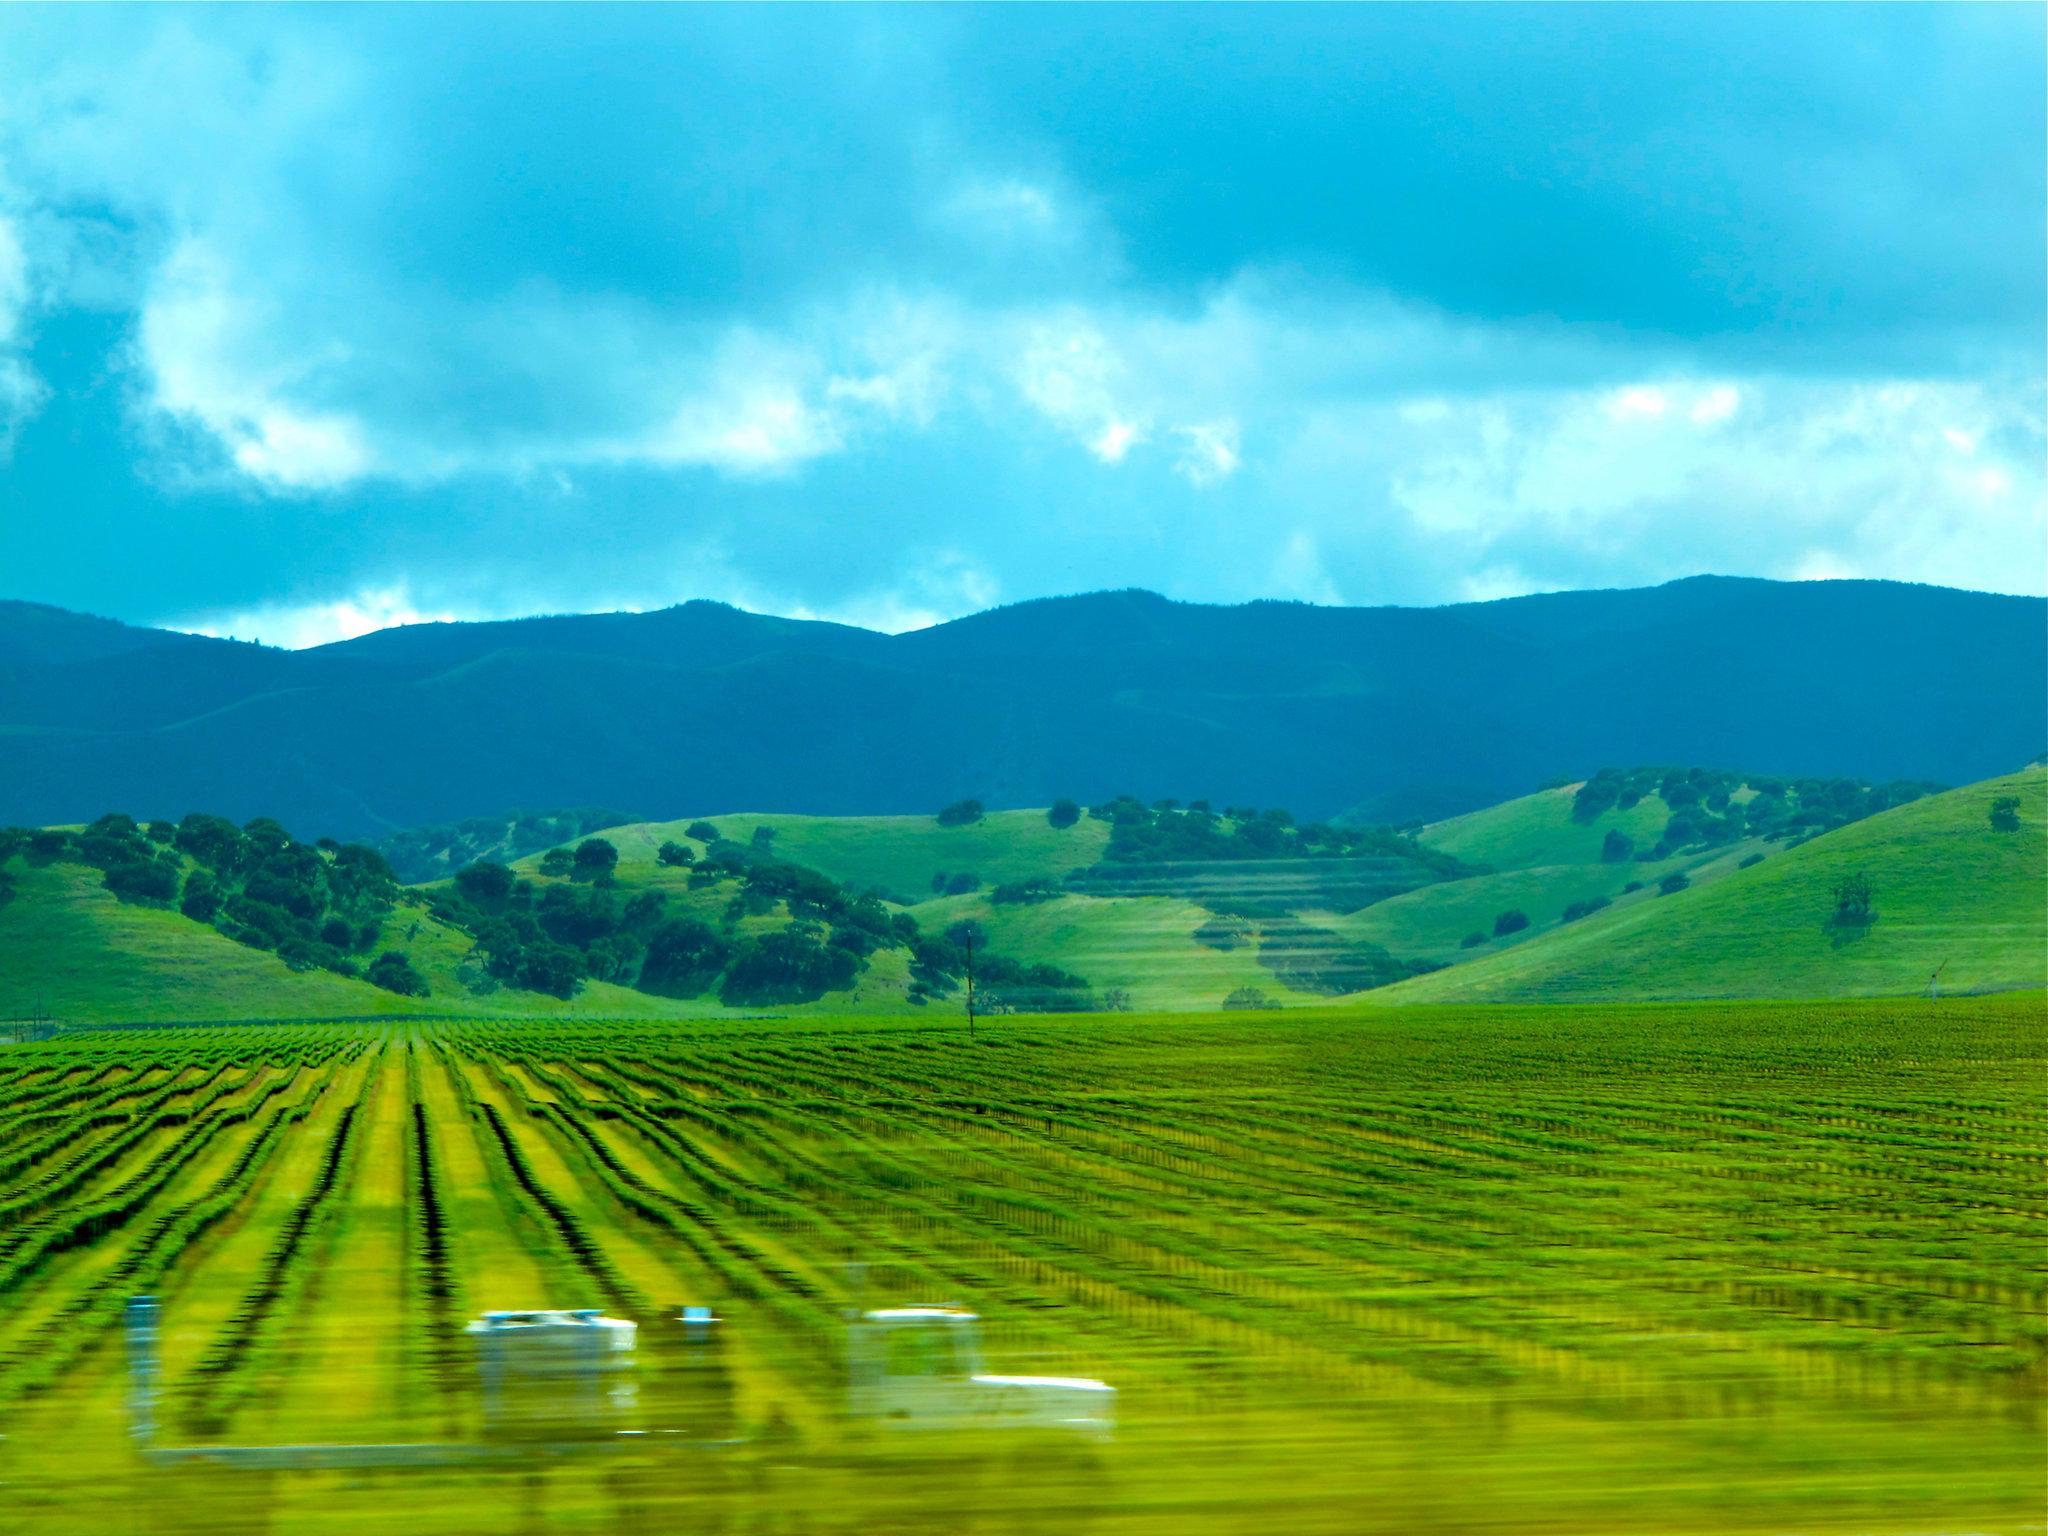 © CORDAY - Vineyard In Motion